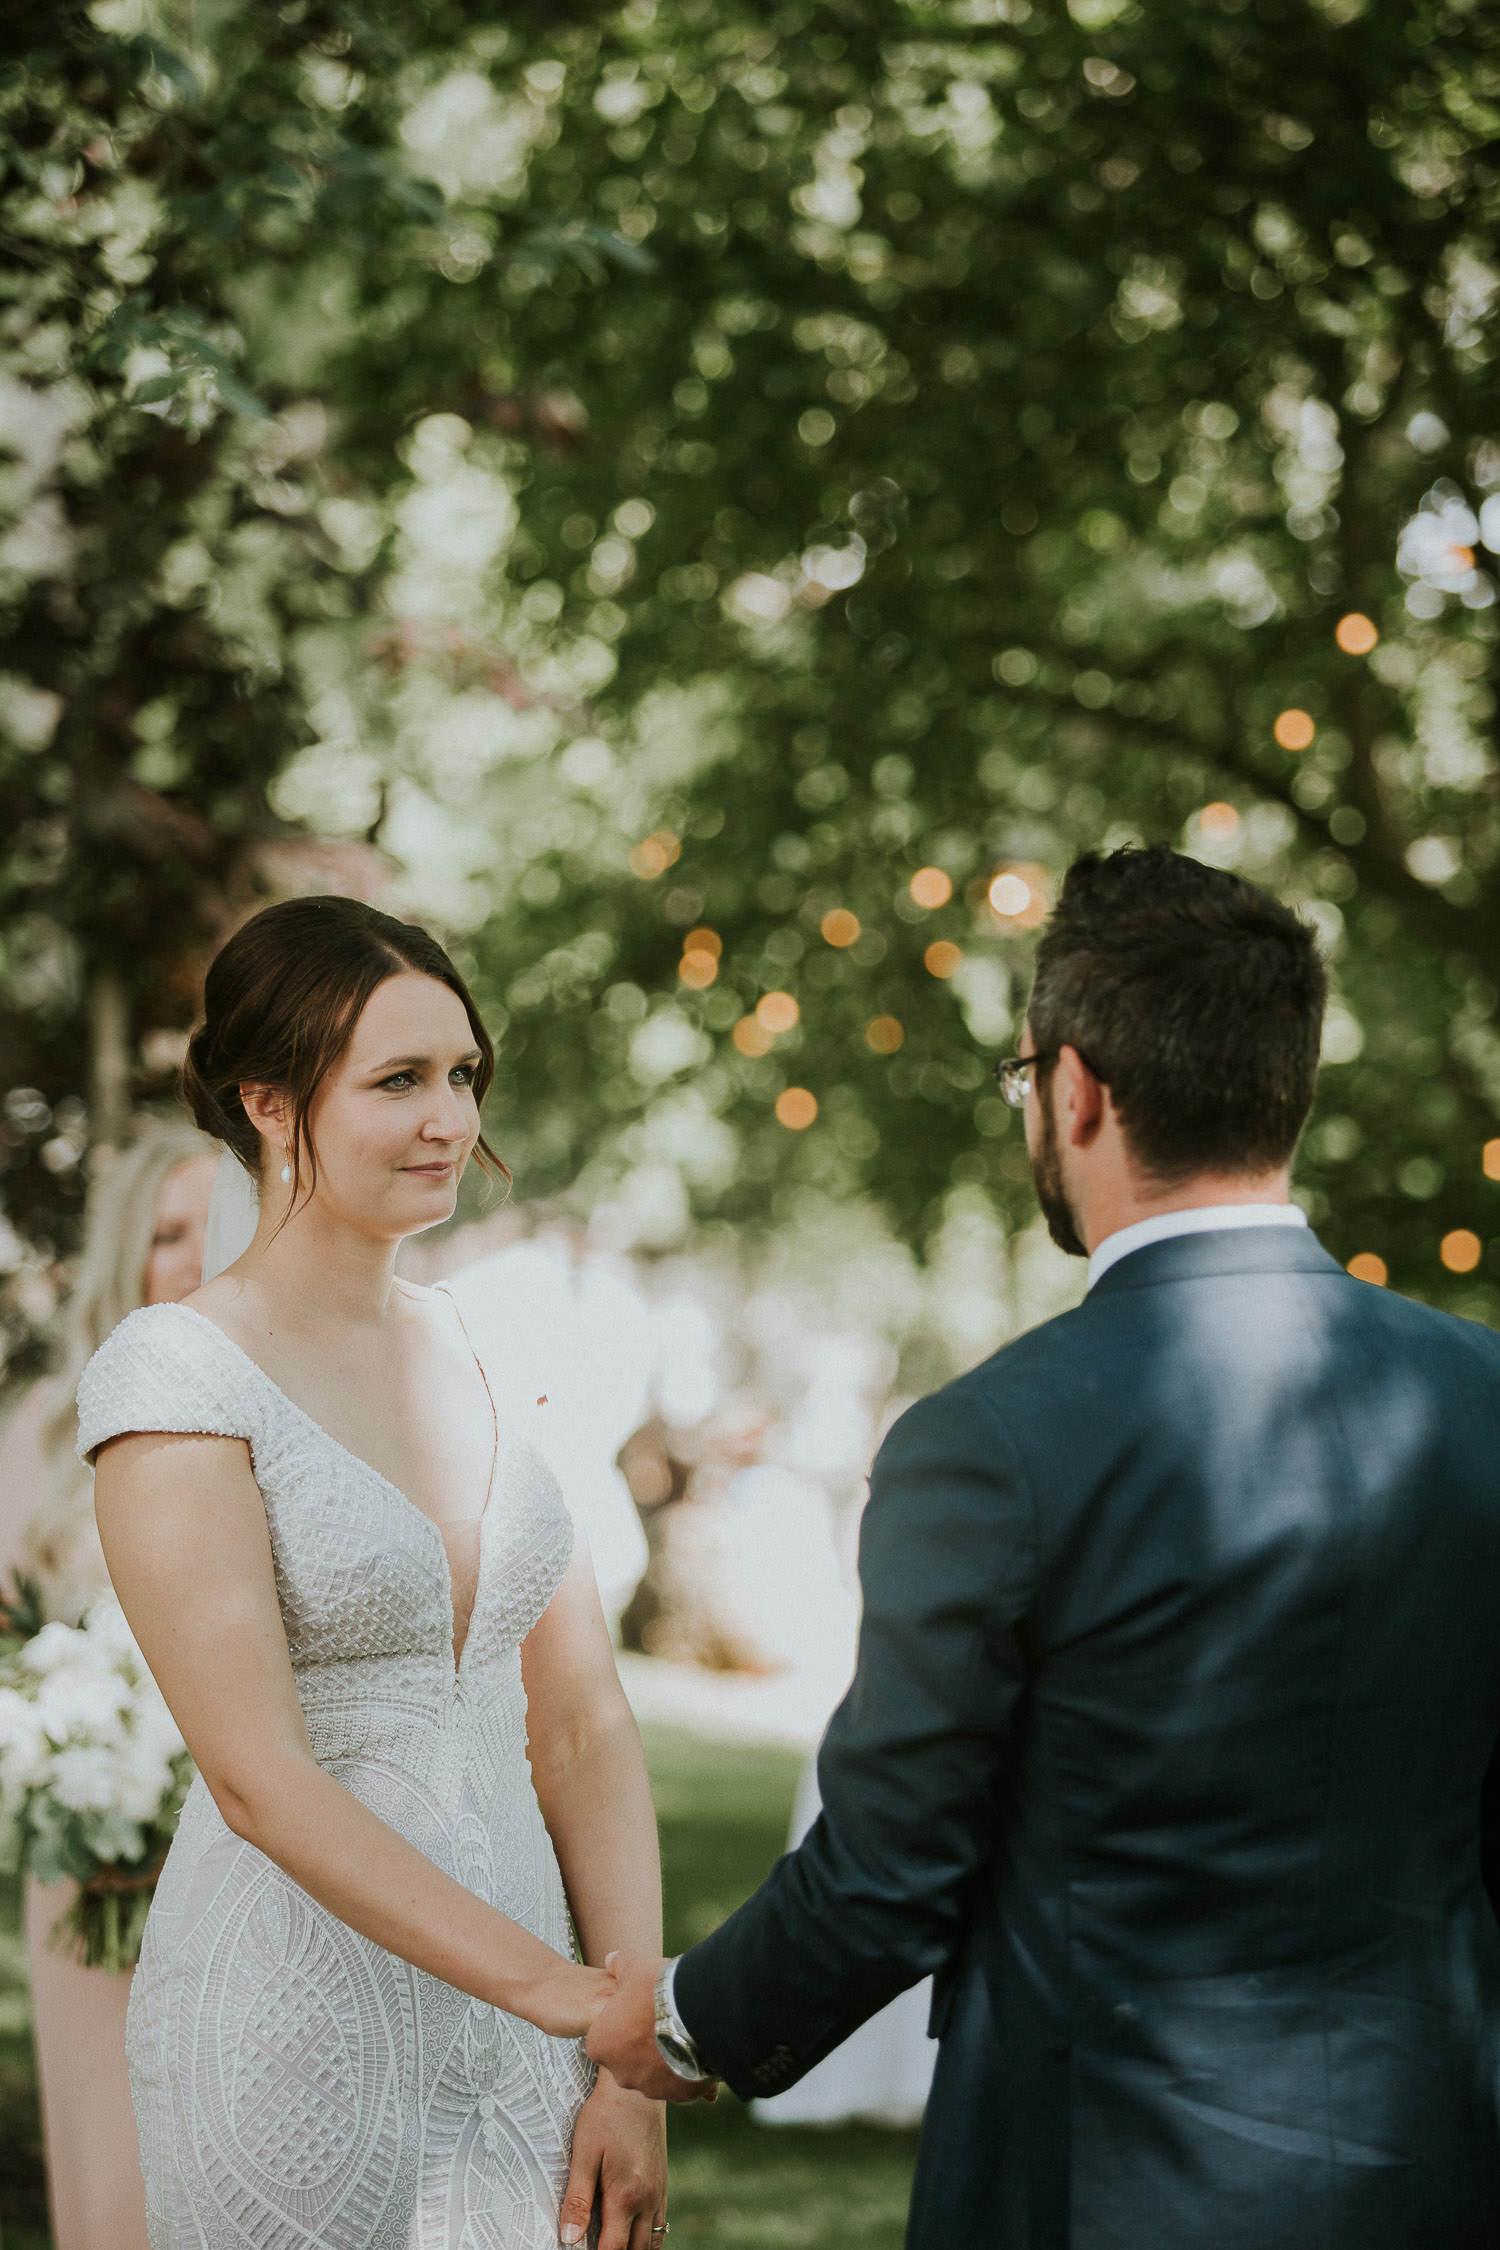 summer-backyard-wedding-in-alberta-sarah-pukin-0099